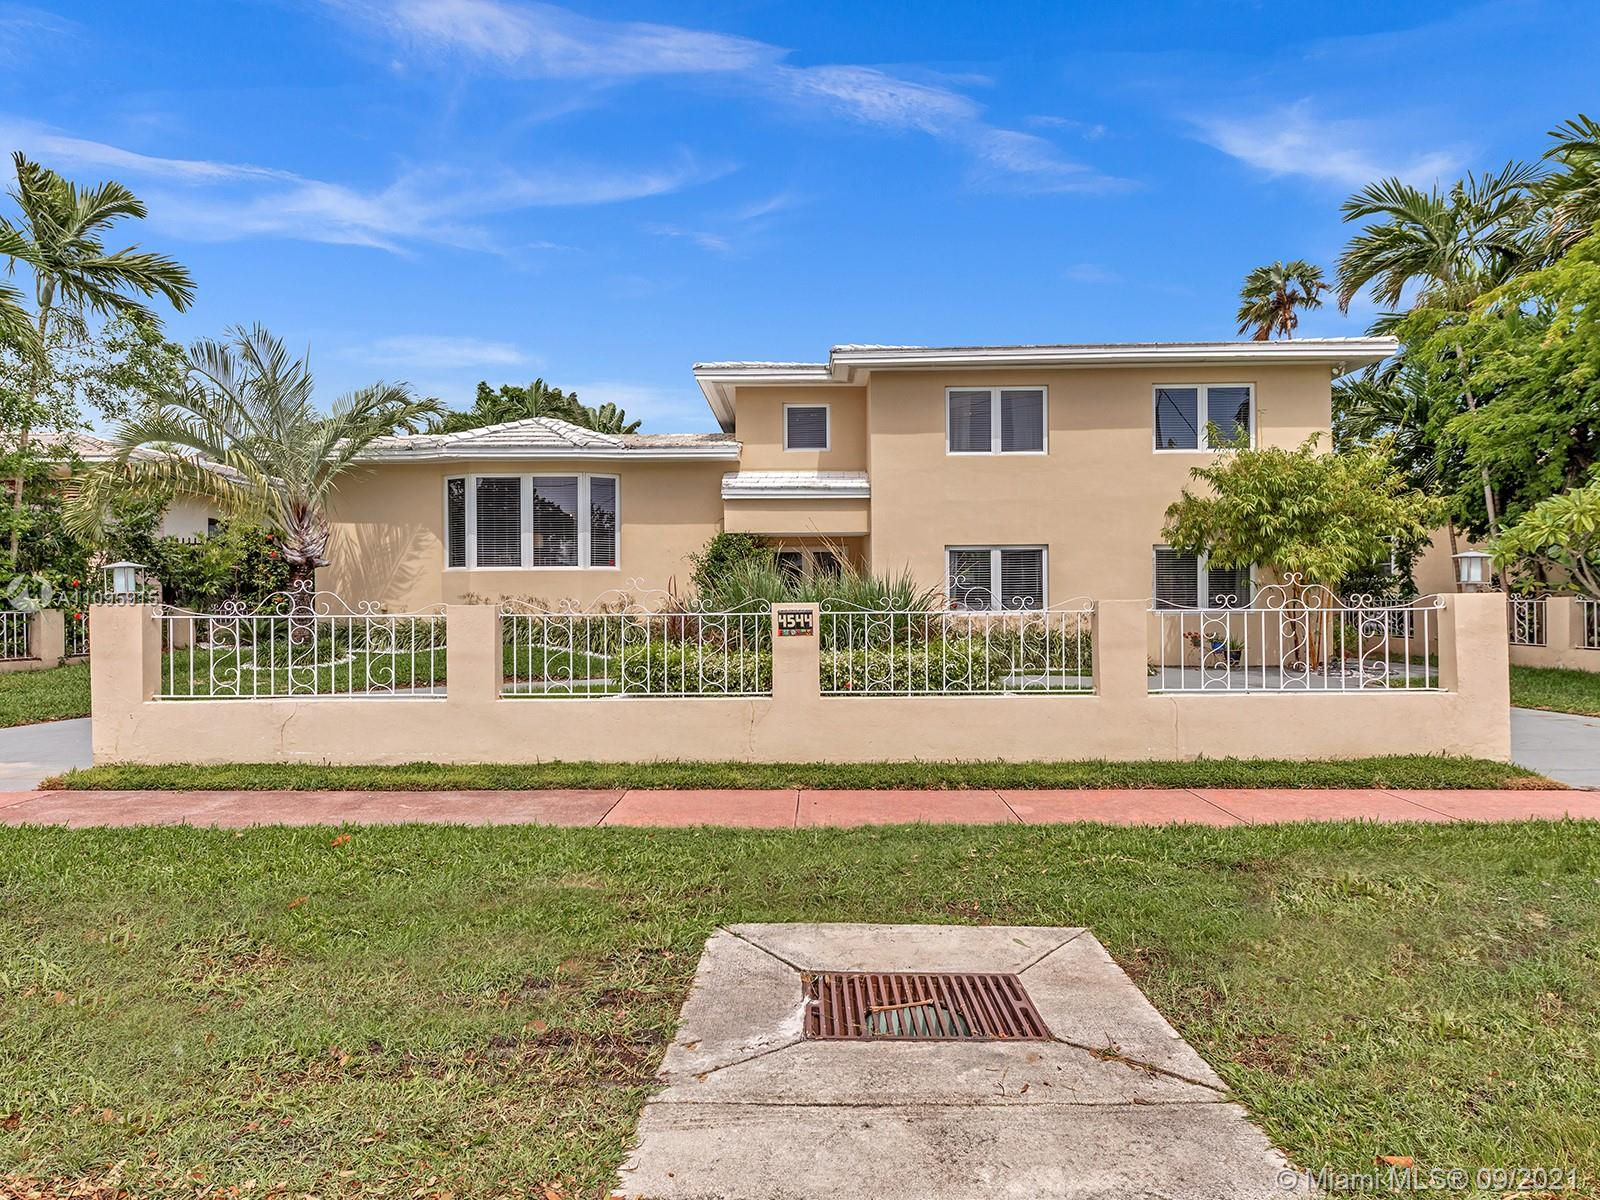 4544 Jefferson Av, Miami Beach, Florida 33140